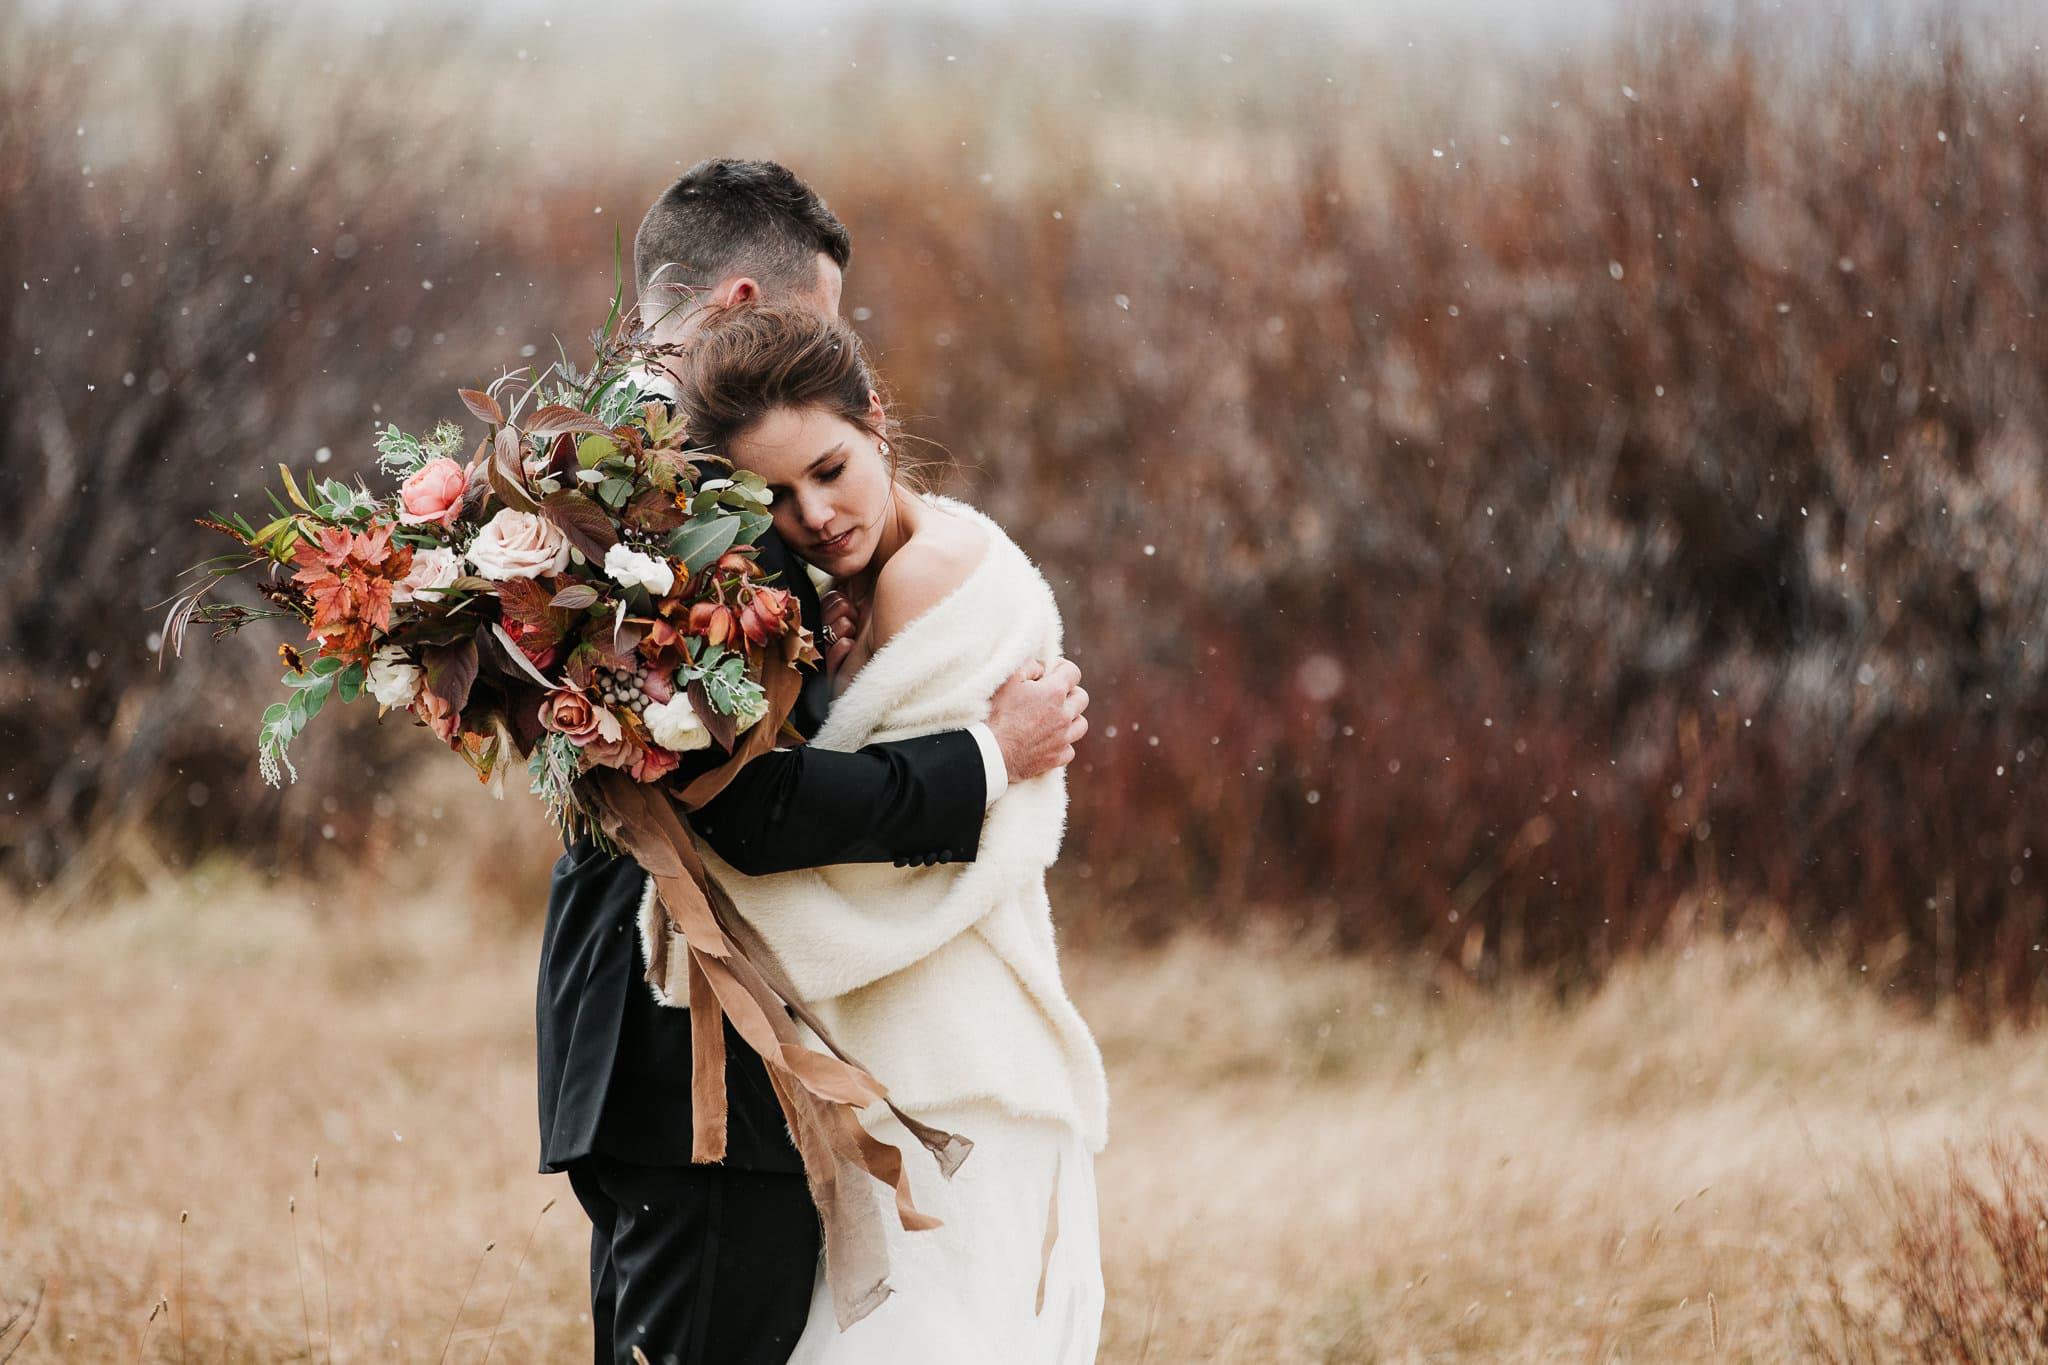 Colorado adventure wedding photographer Devil's Thumb Ranch Winter Wedding